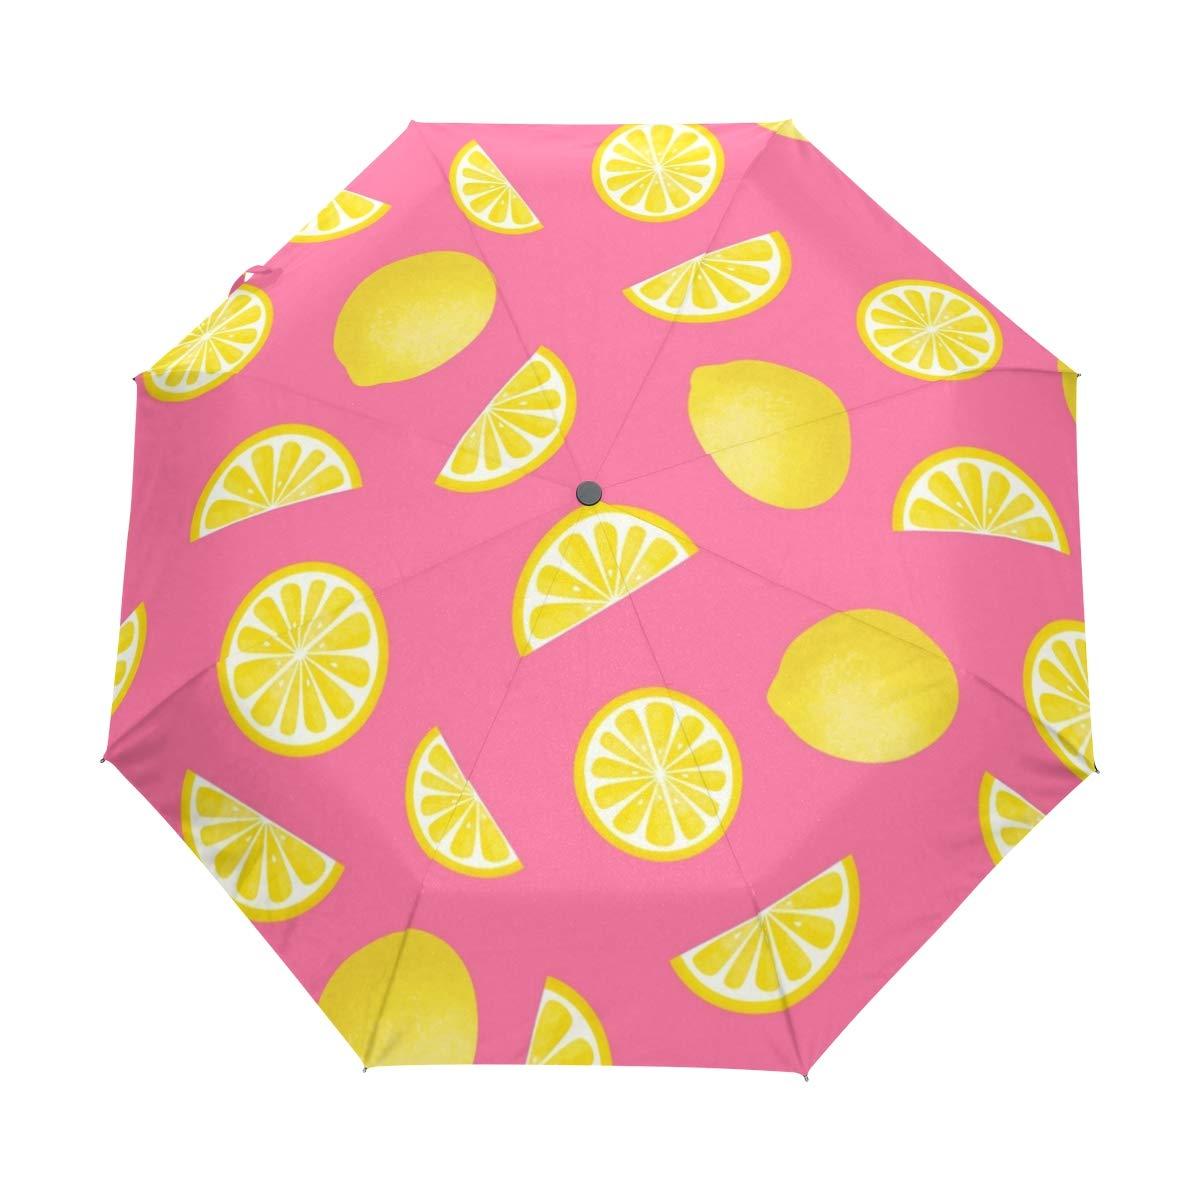 8e7d826b15fd Amazon.com: HLive Travel Umbrella Lemon Fruit Auto Open Compact ...